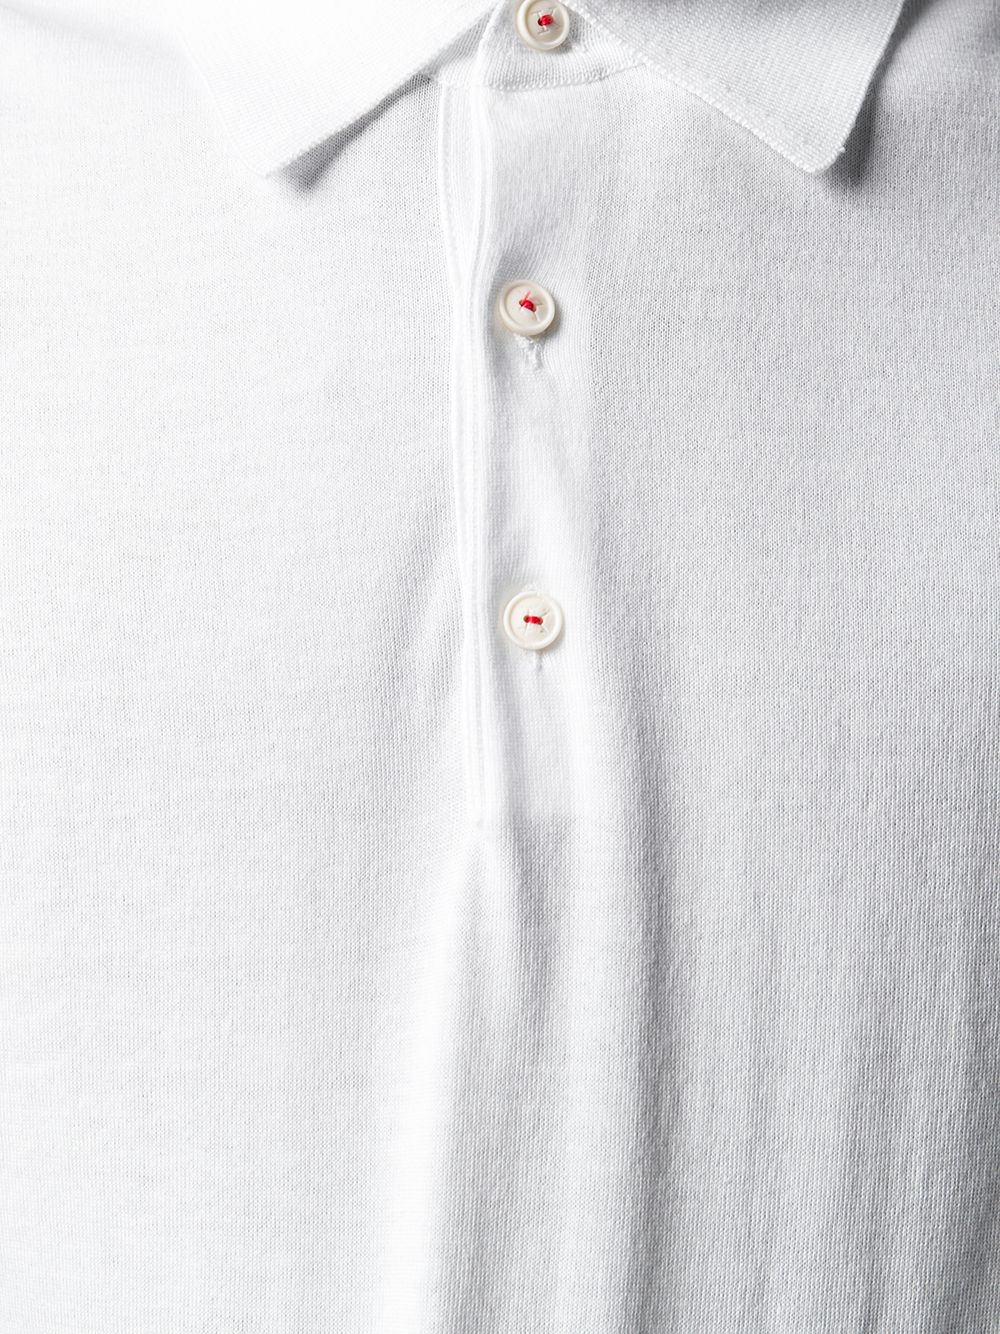 70b37d982 White Cotton Polo Shirt - KITON - Russocapri